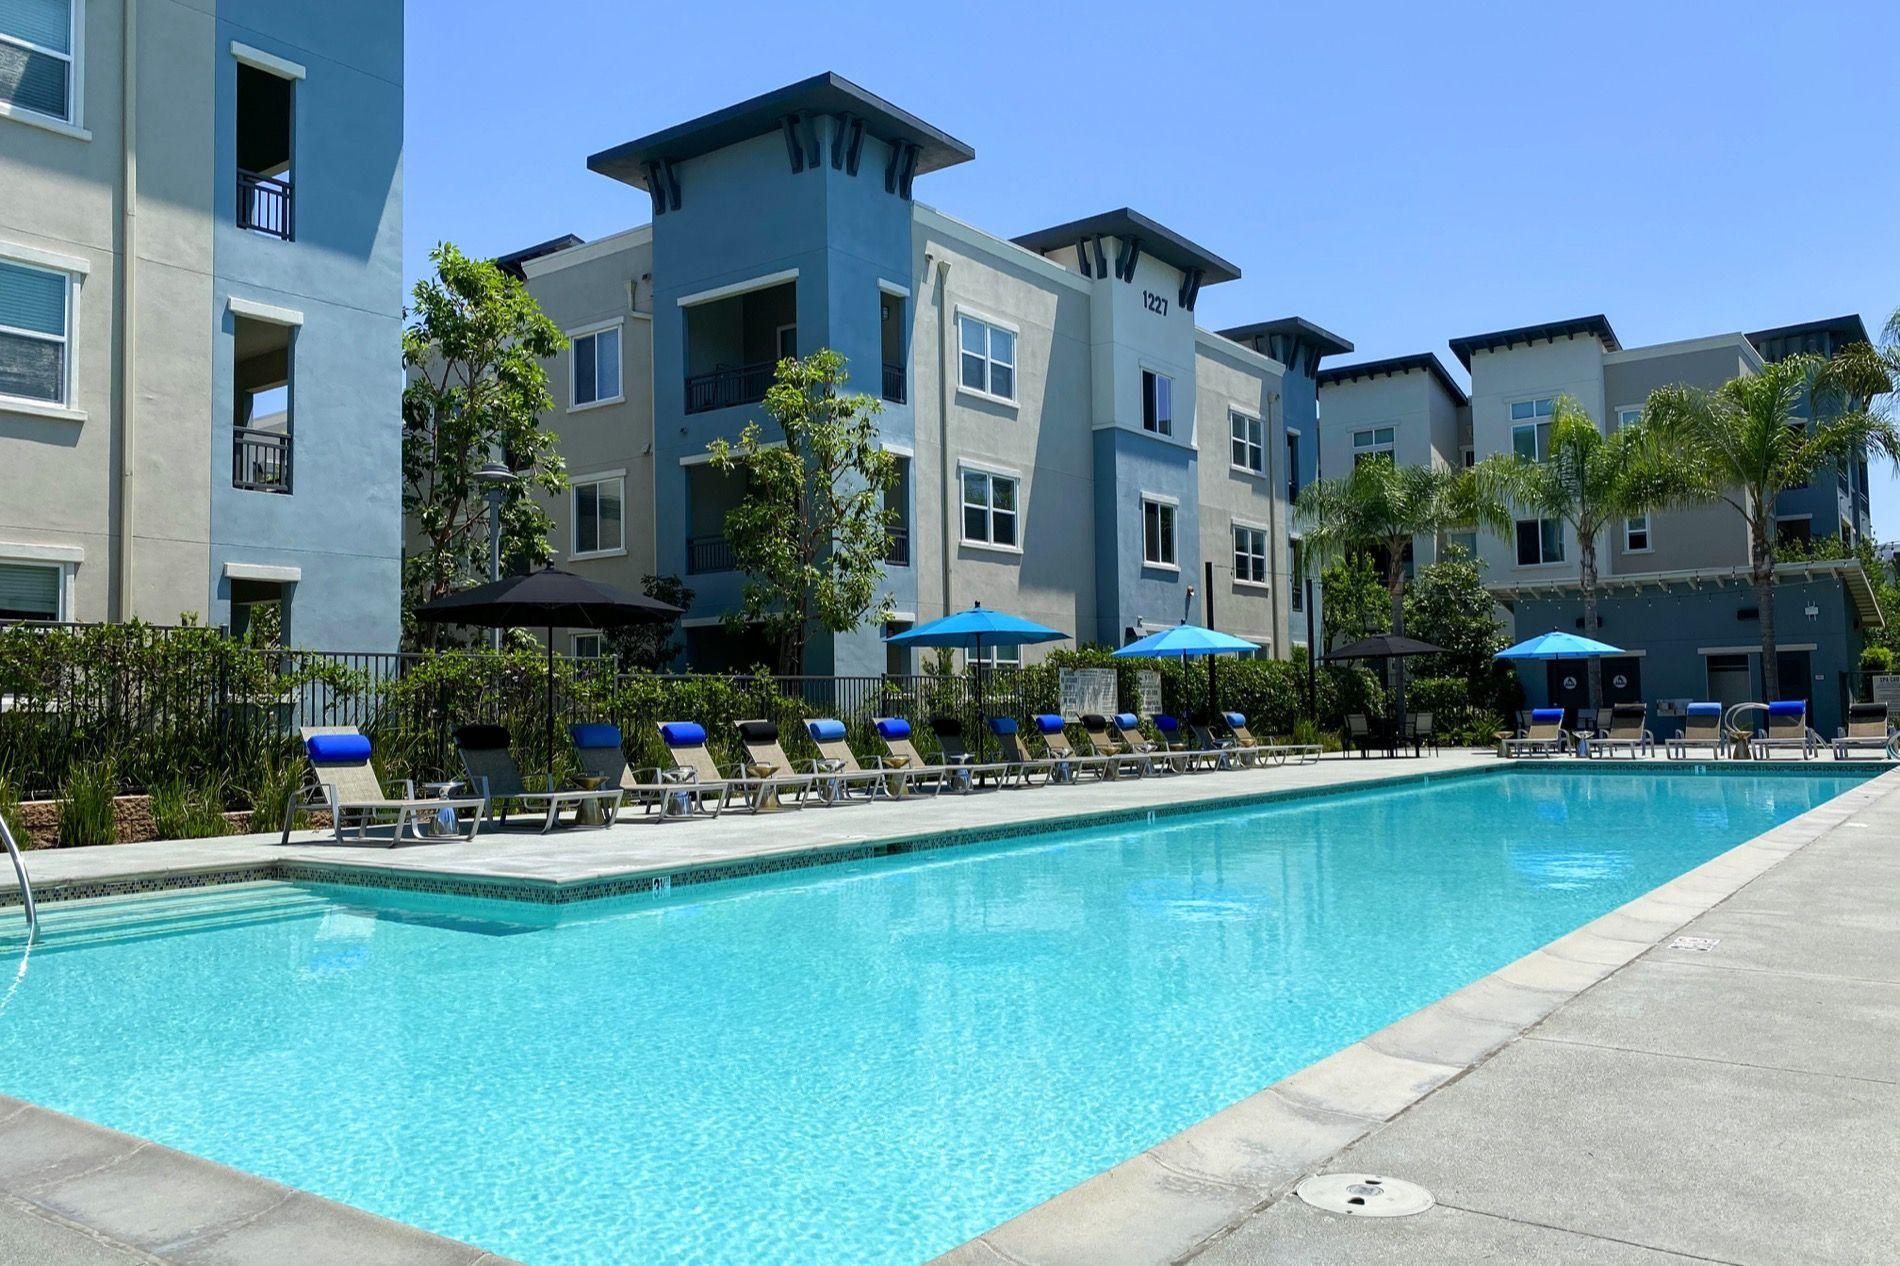 Apartments Near Cal State San Marcos Palomar Station for Cal State San Marcos Students in San Marcos, CA